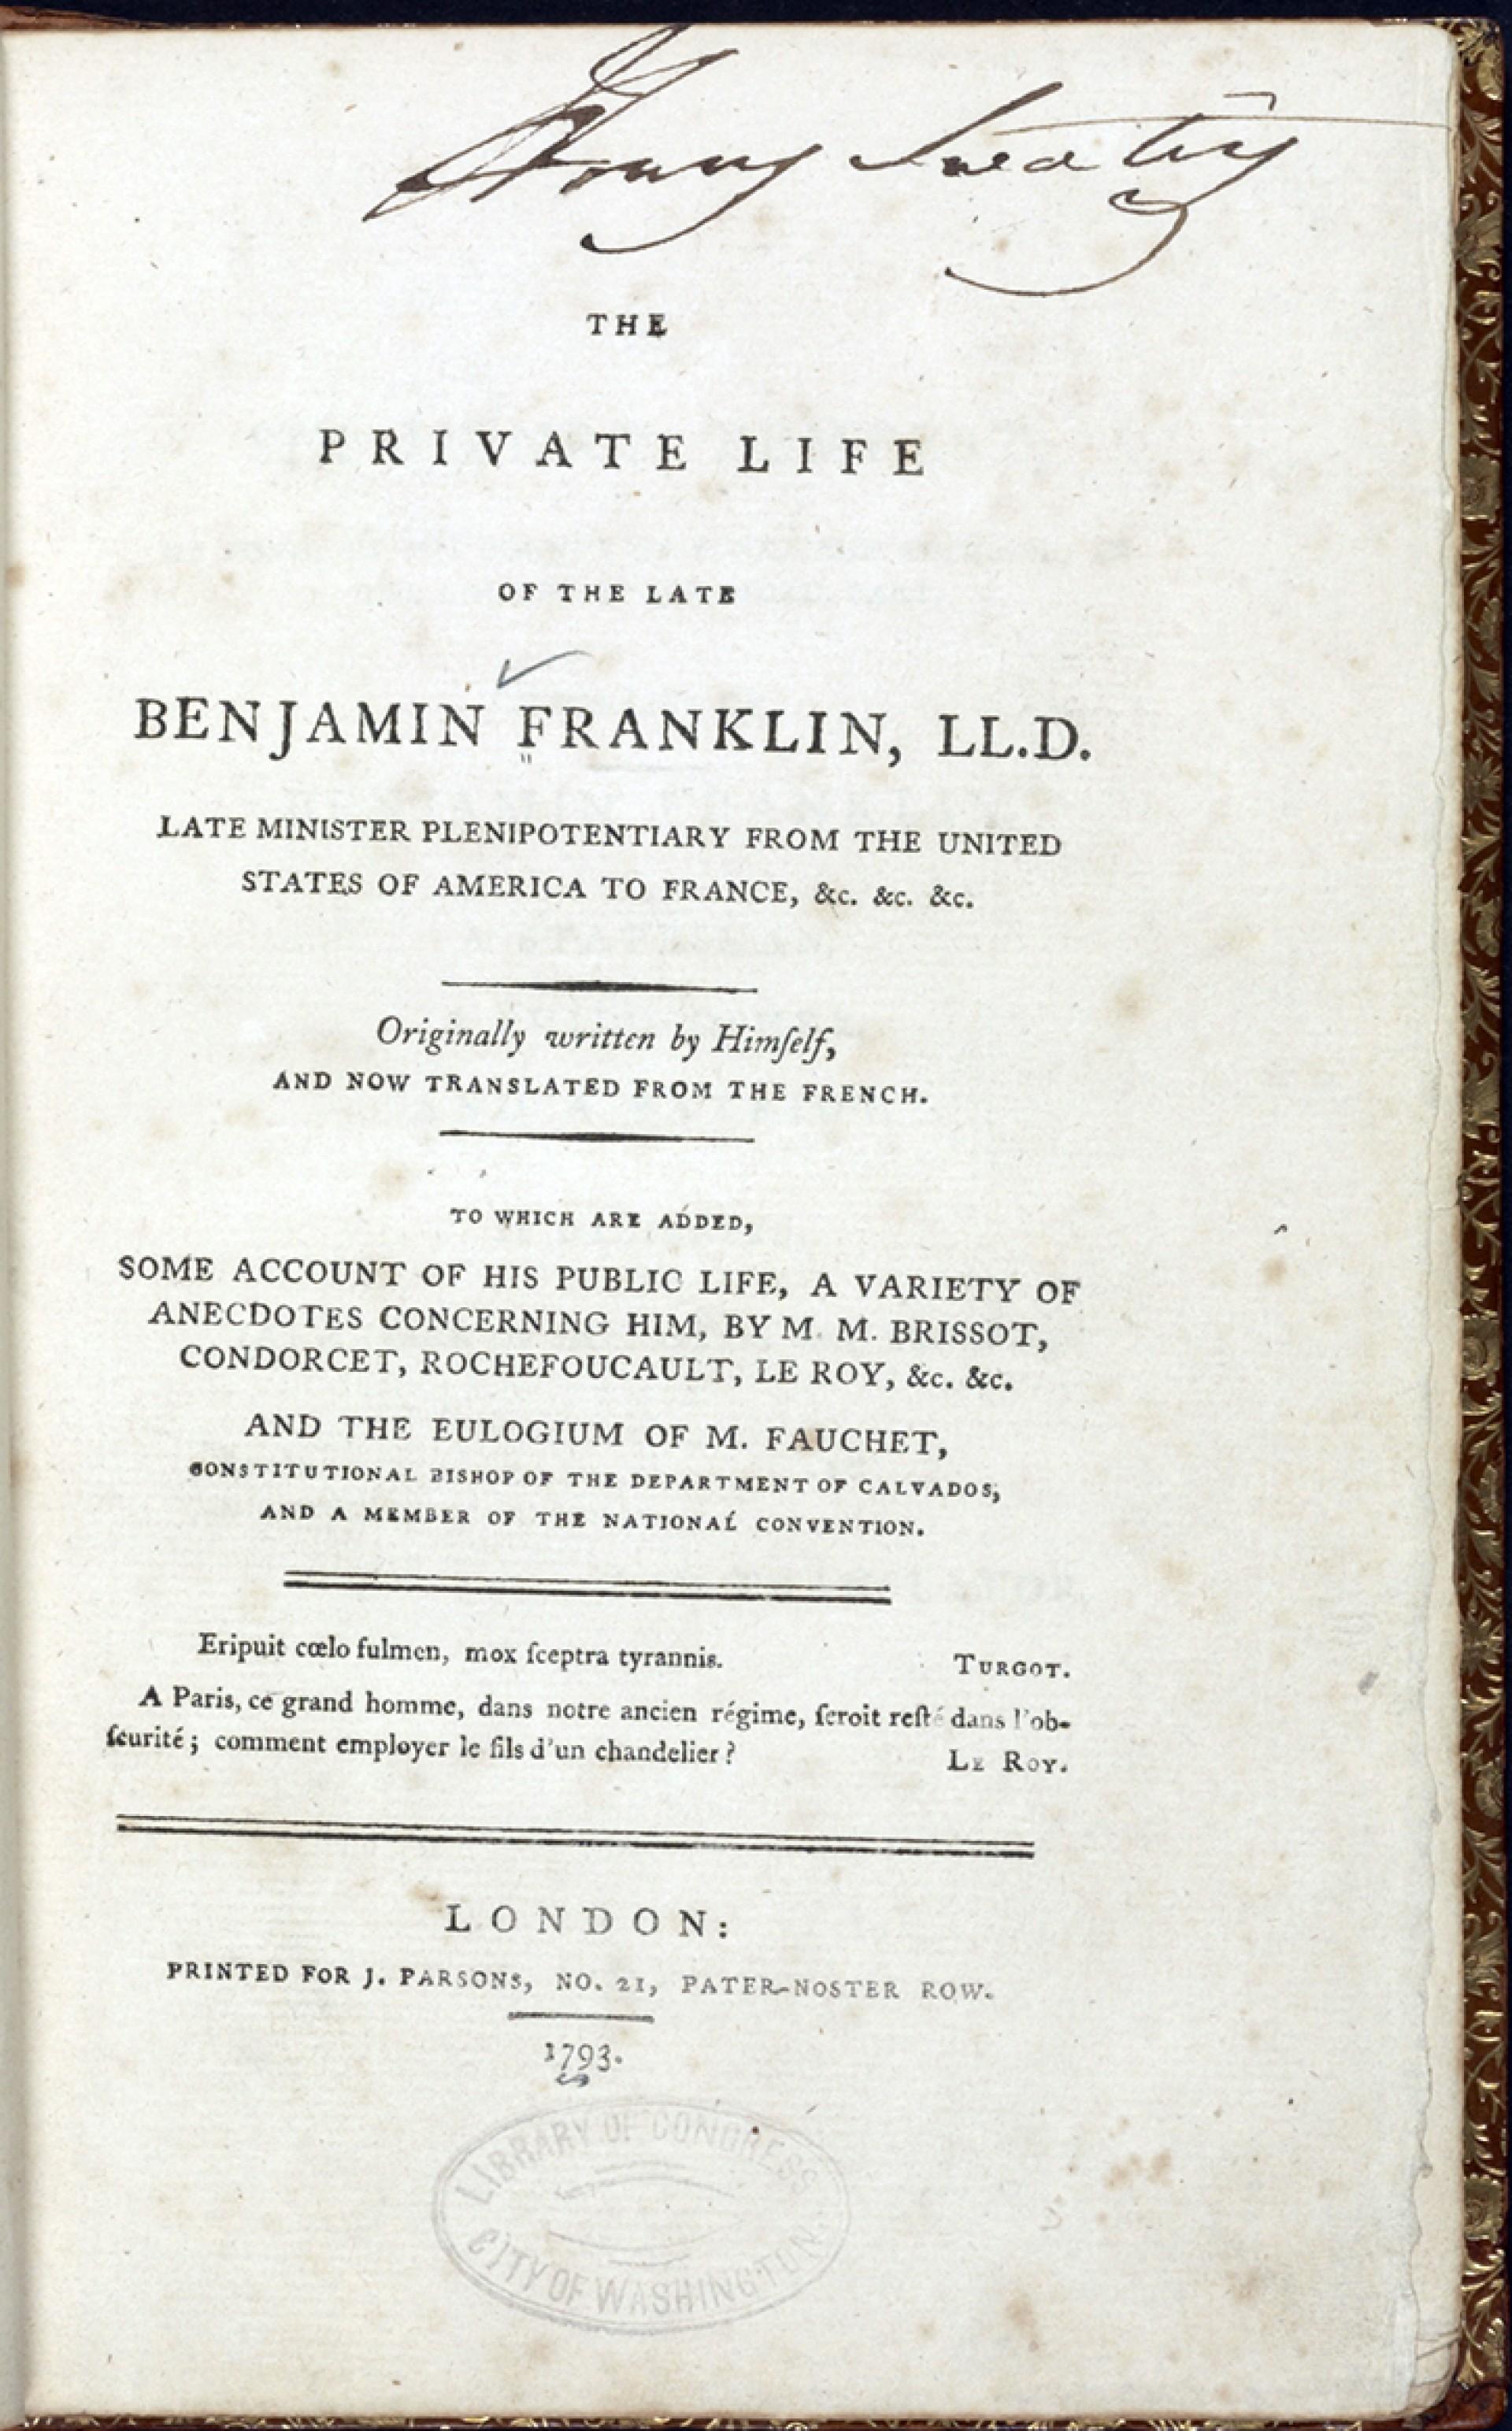 016 Ba0009 Enlarge Benjamin Franklin Essay Unbelievable Thesis Statement Conclusion 1920